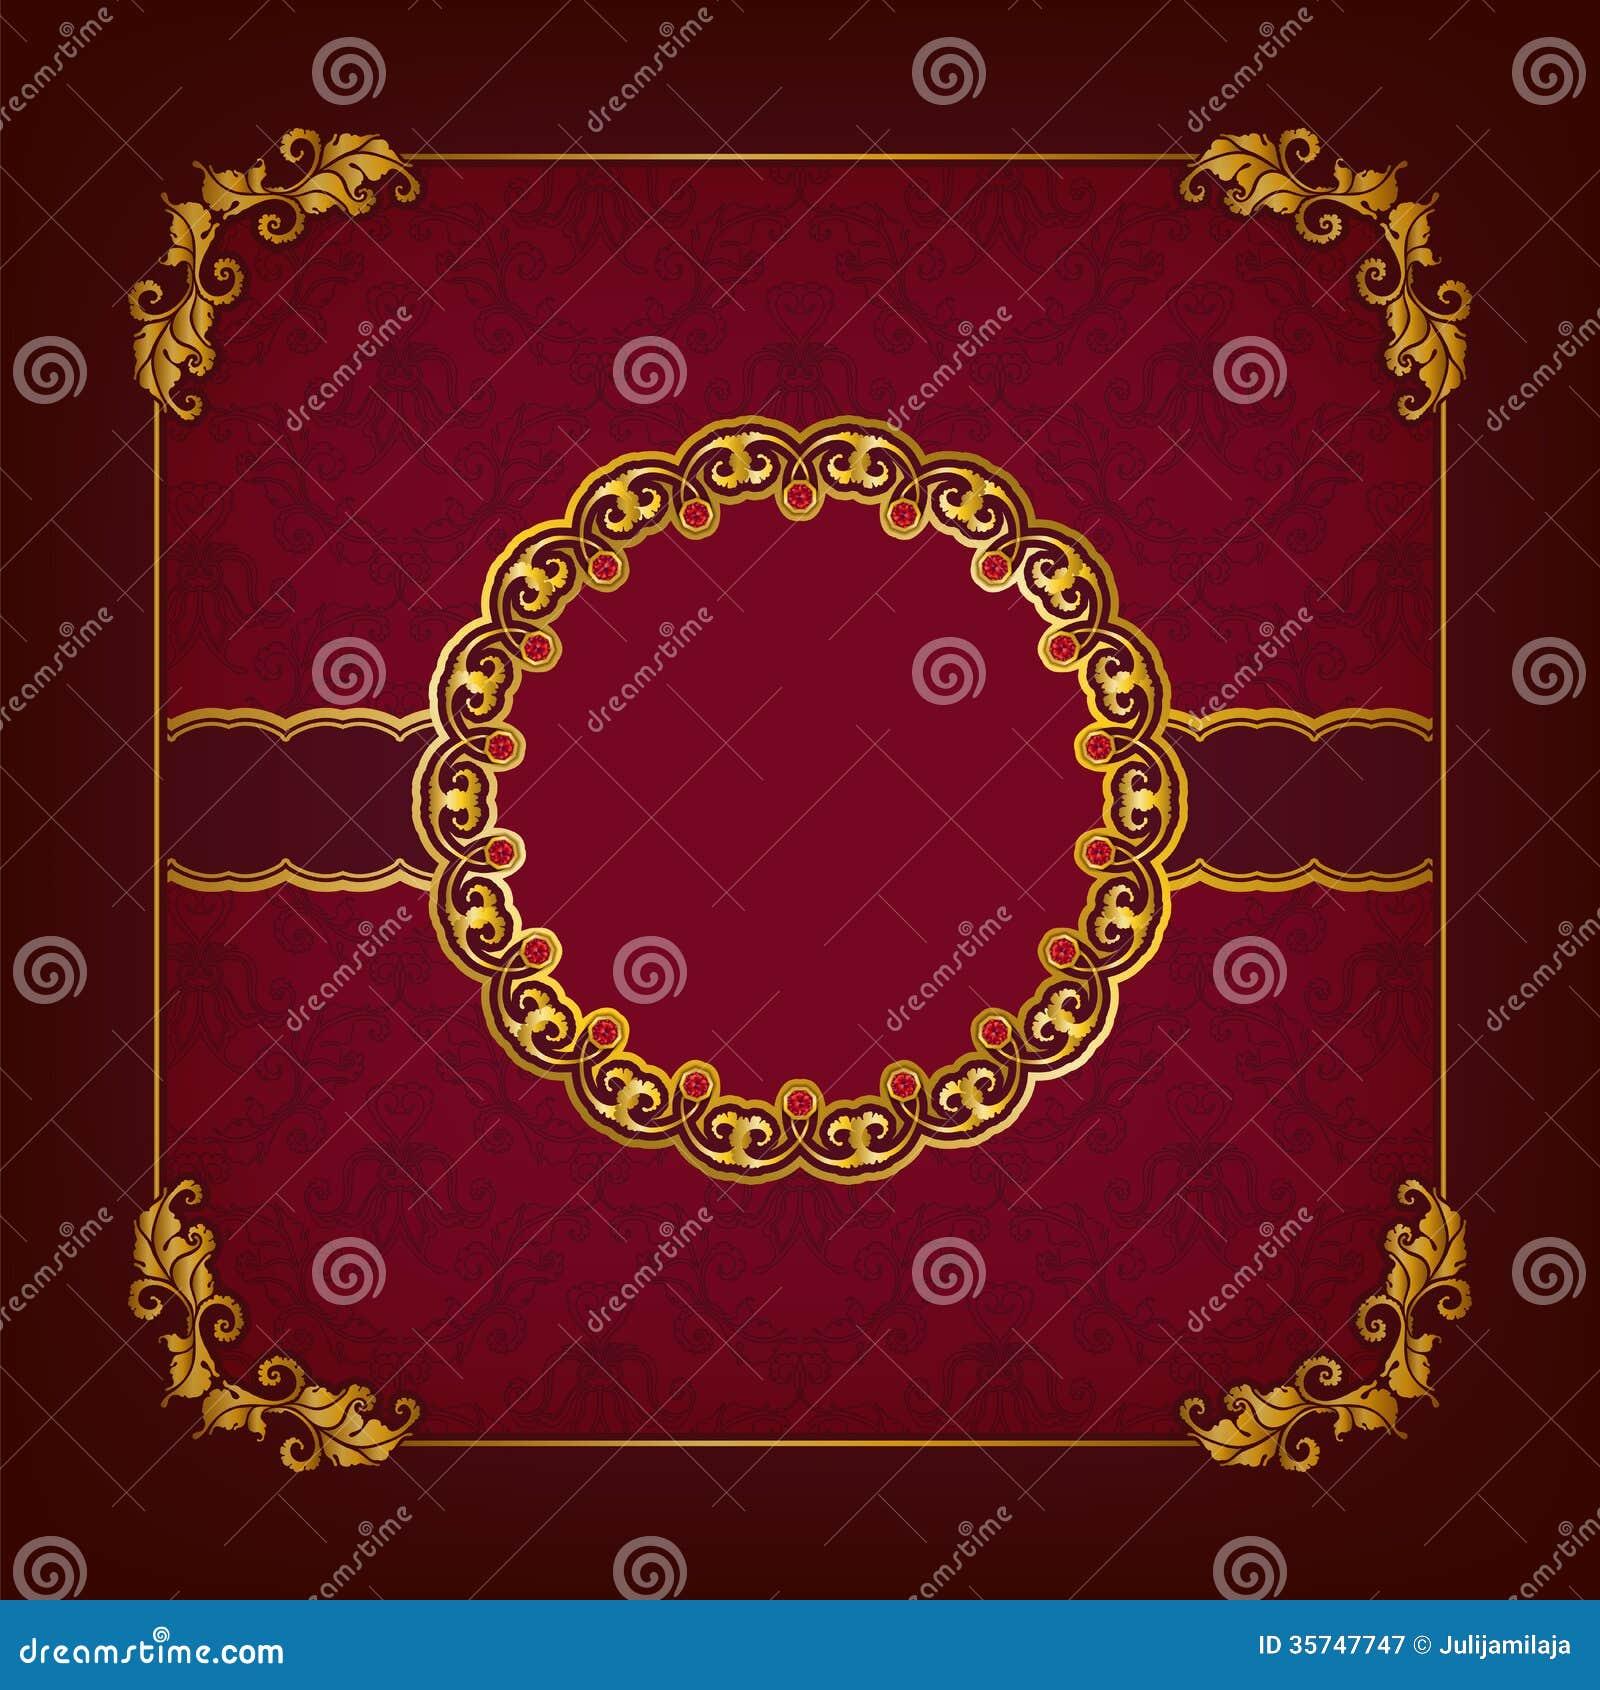 Elegant Template For Vip Luxury Invitation Royalty Free ...